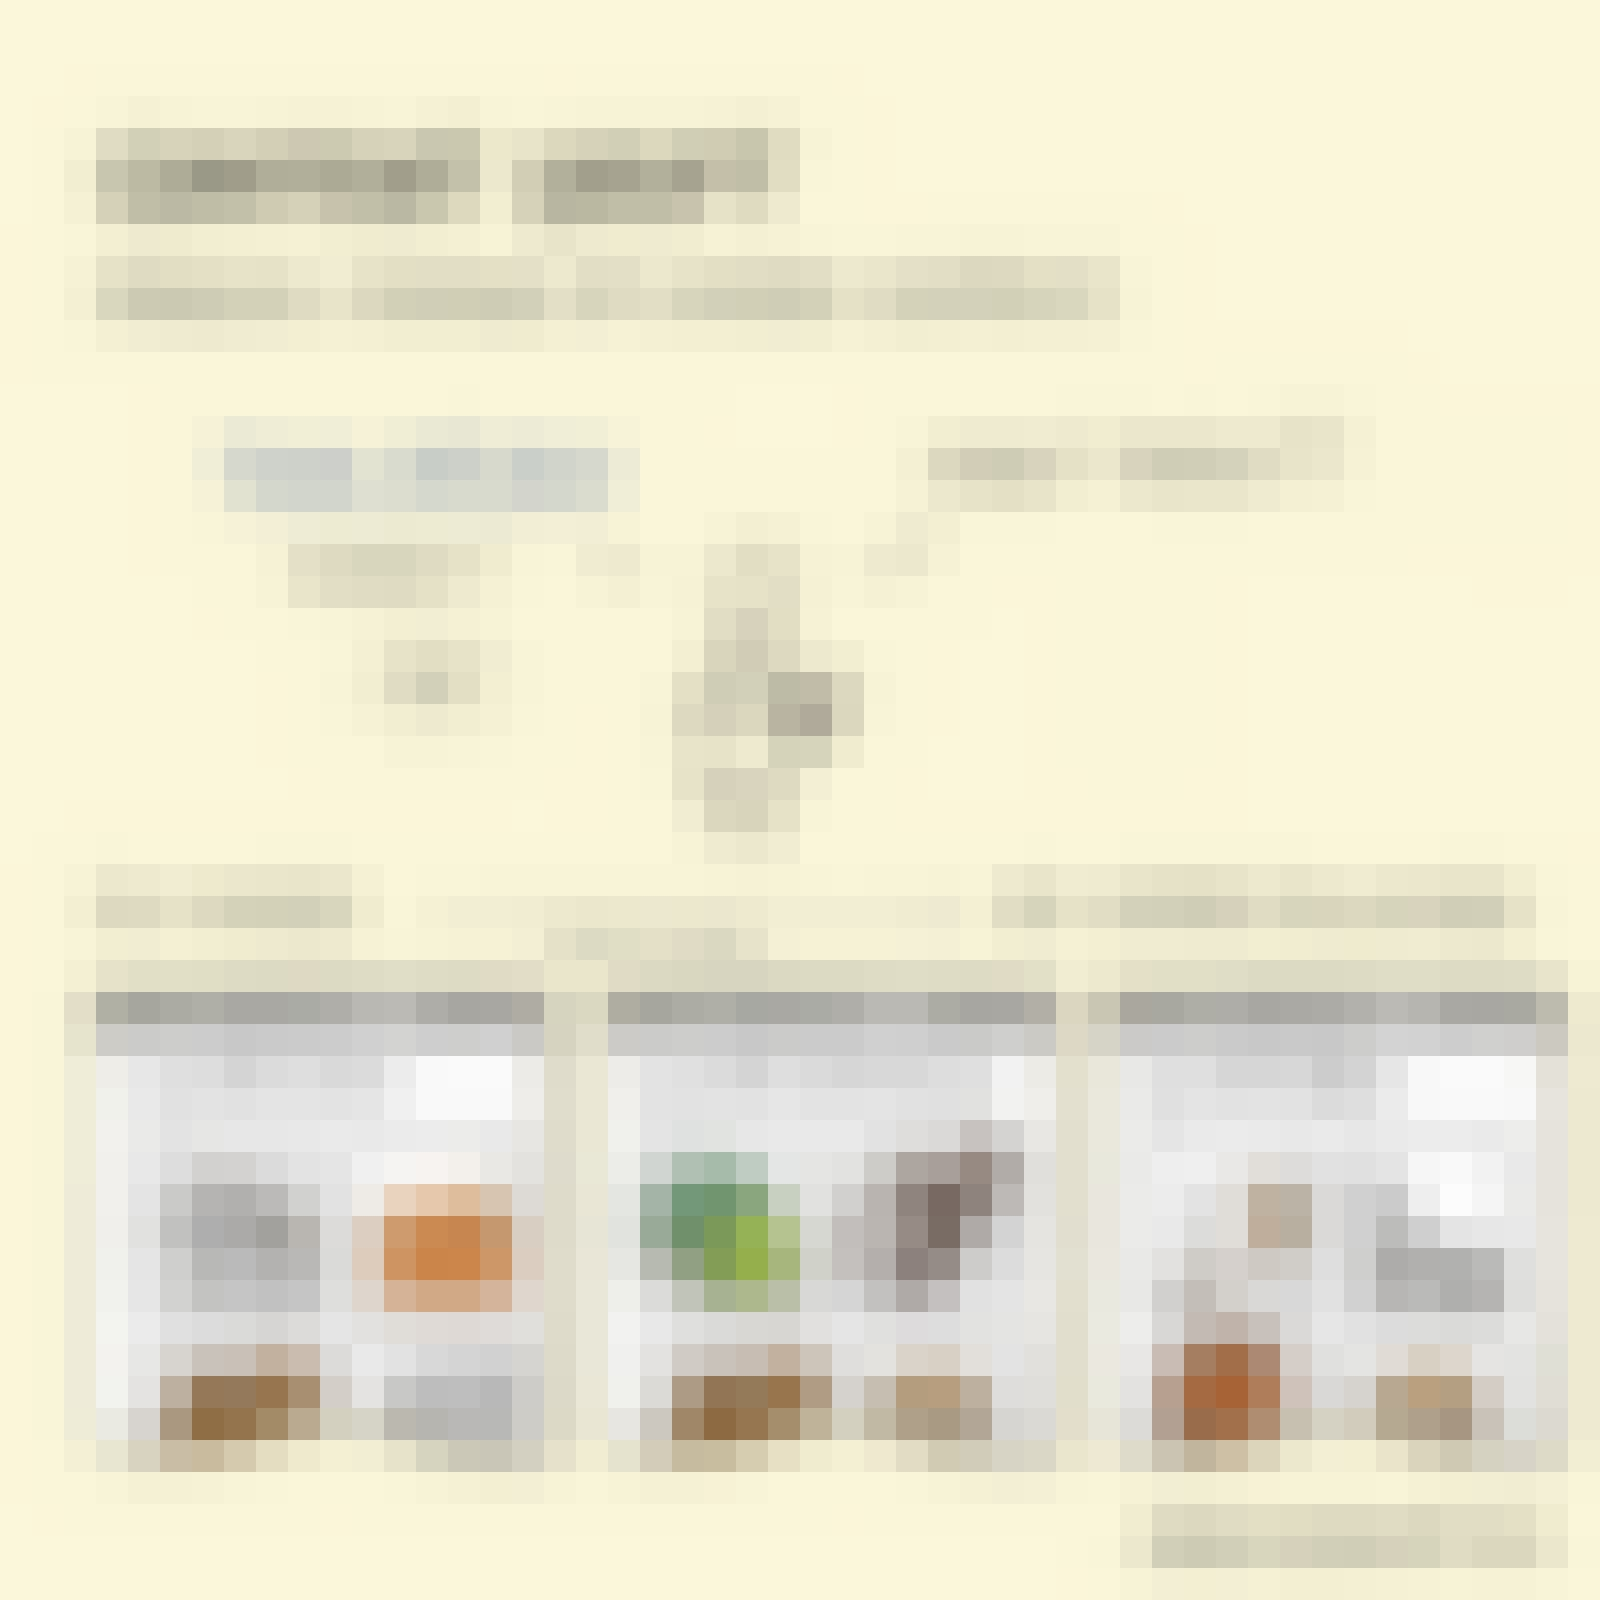 Content drift - Sketchplanations